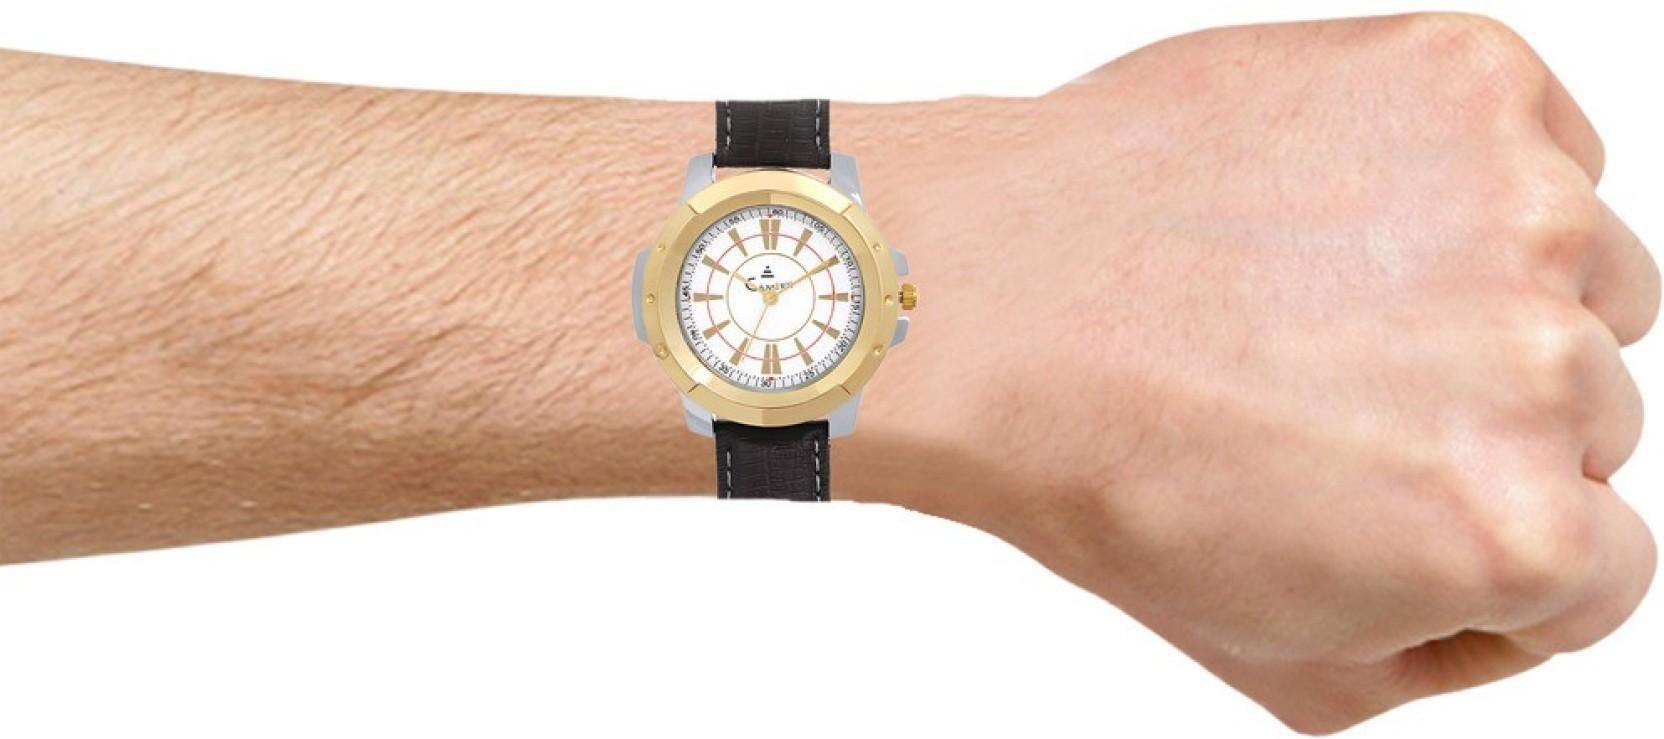 Camerii WM166 Watch - For Men